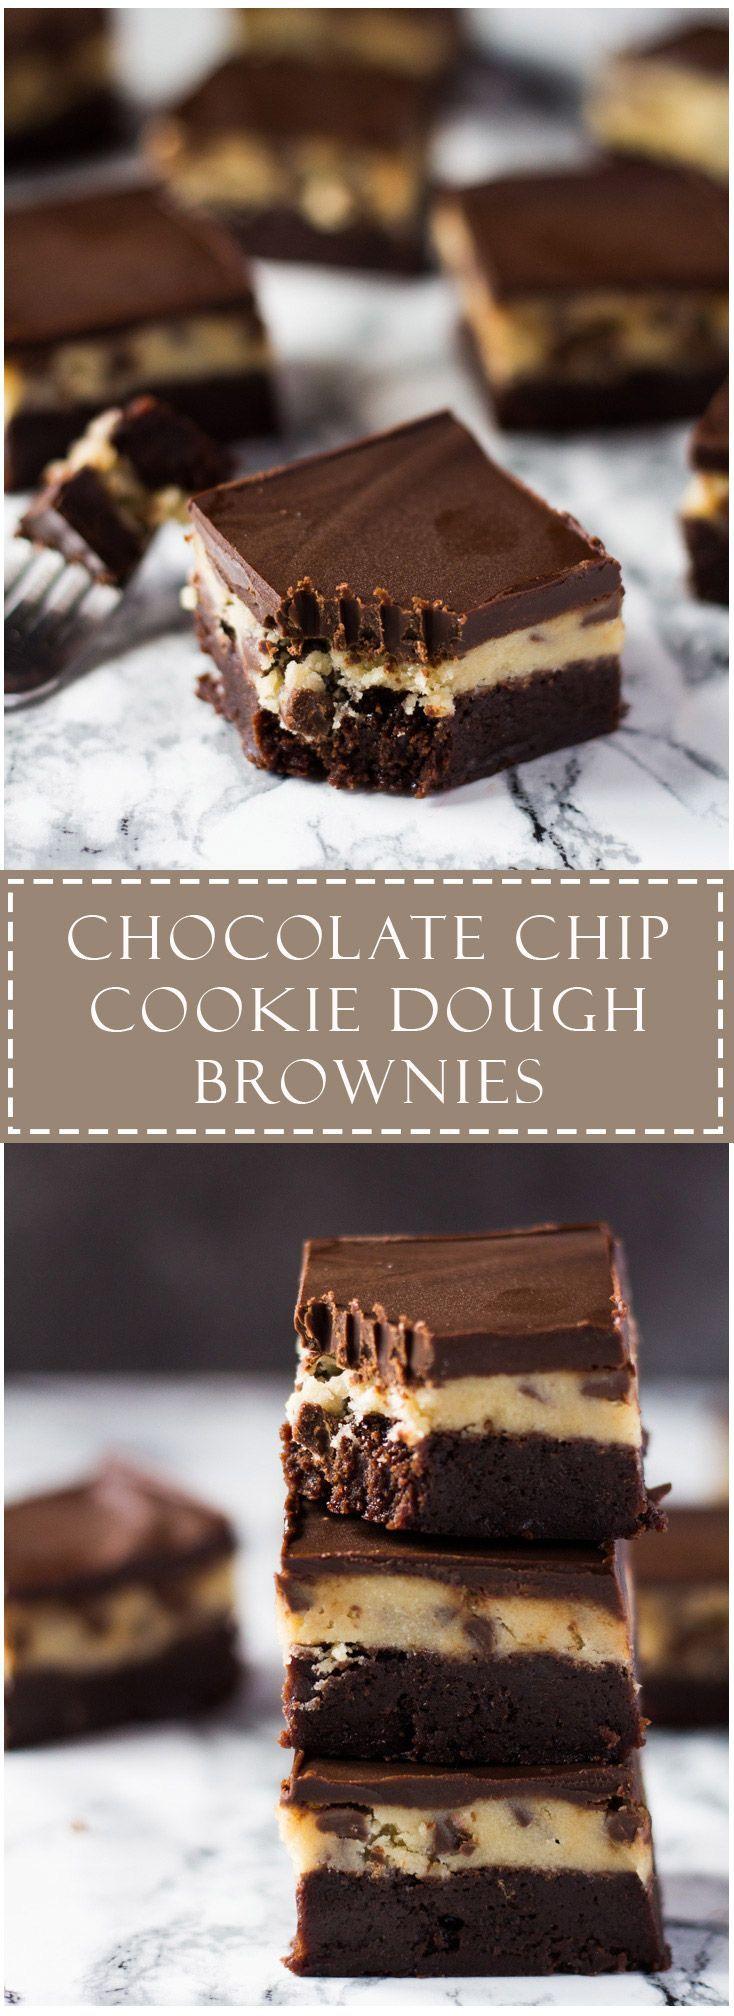 Chocolate Chip Cookie Dough Brownies   Marsha's Baking Addiction